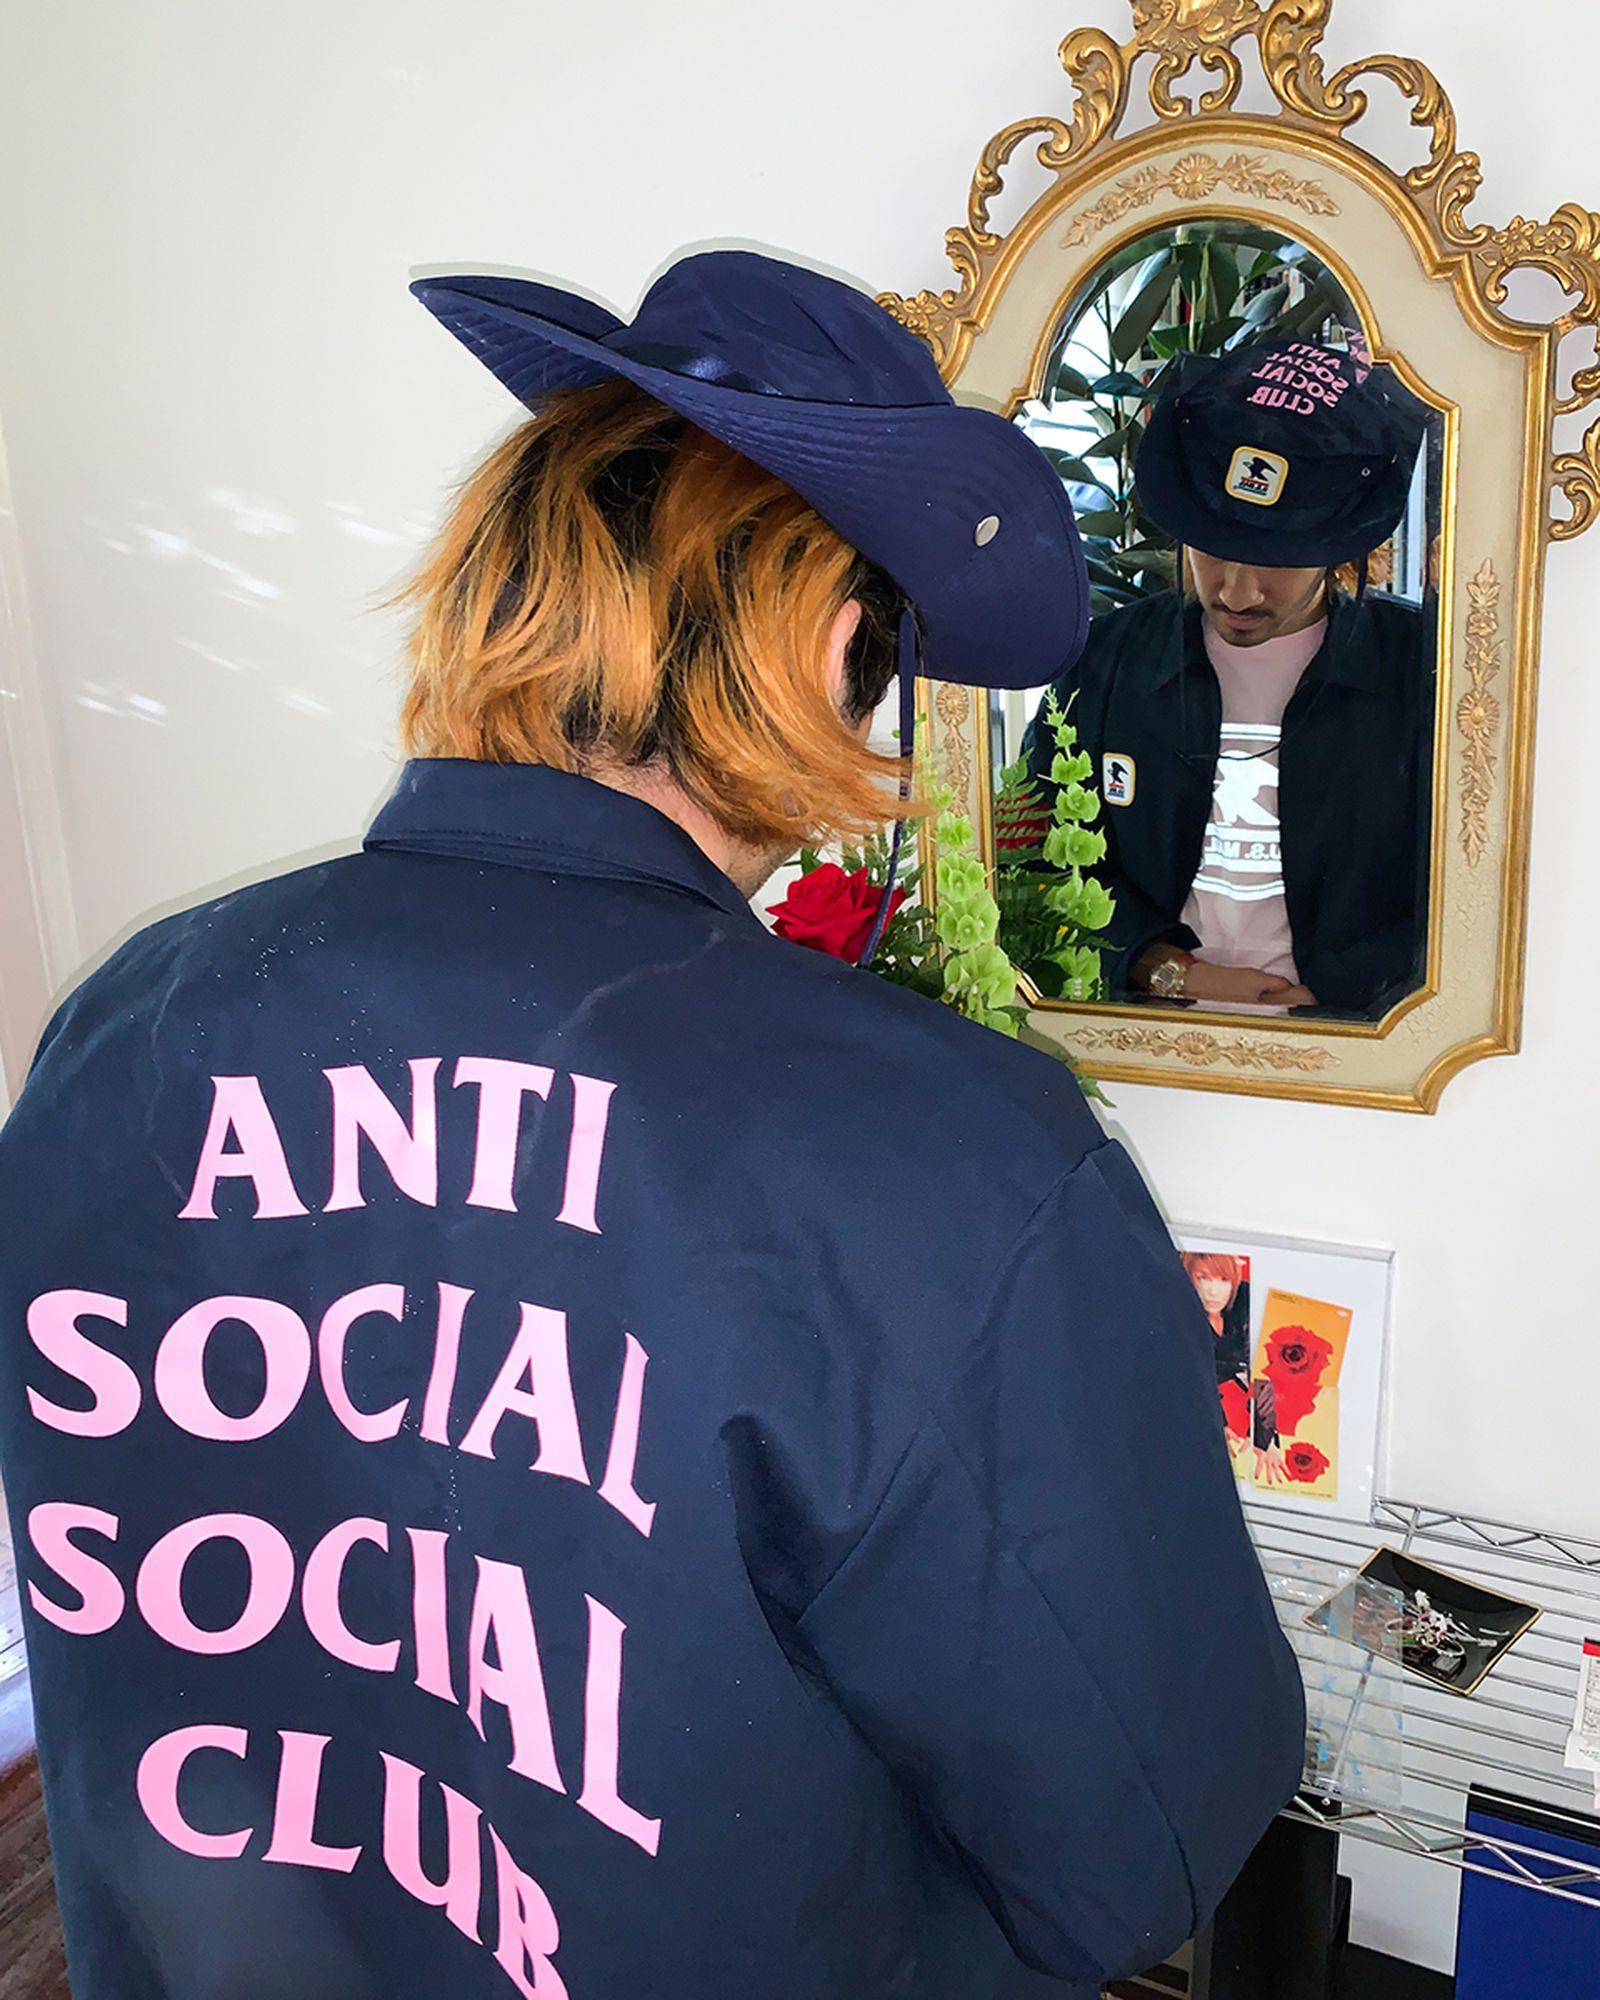 Anti Social Social Club USPS collaboration